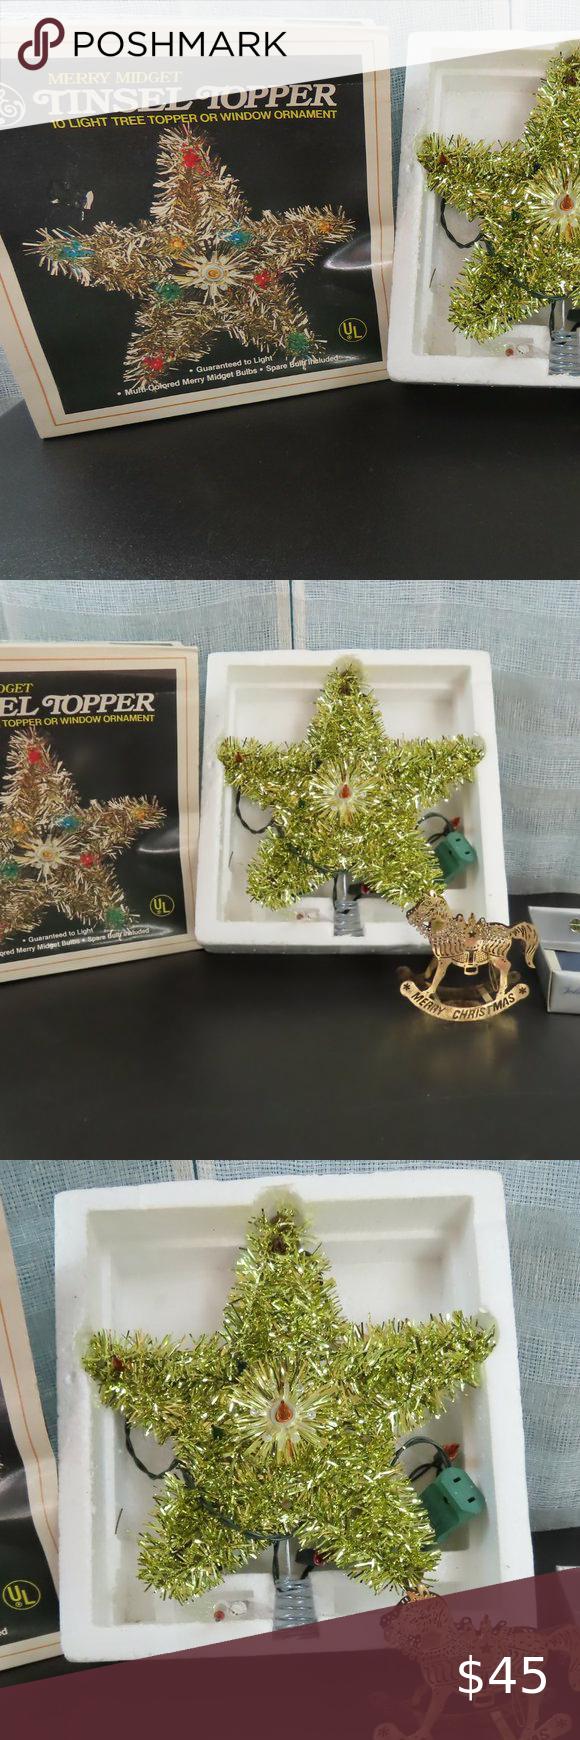 Vintage Merry Midget Tinsel Star Tree TopperNIB NIBthis